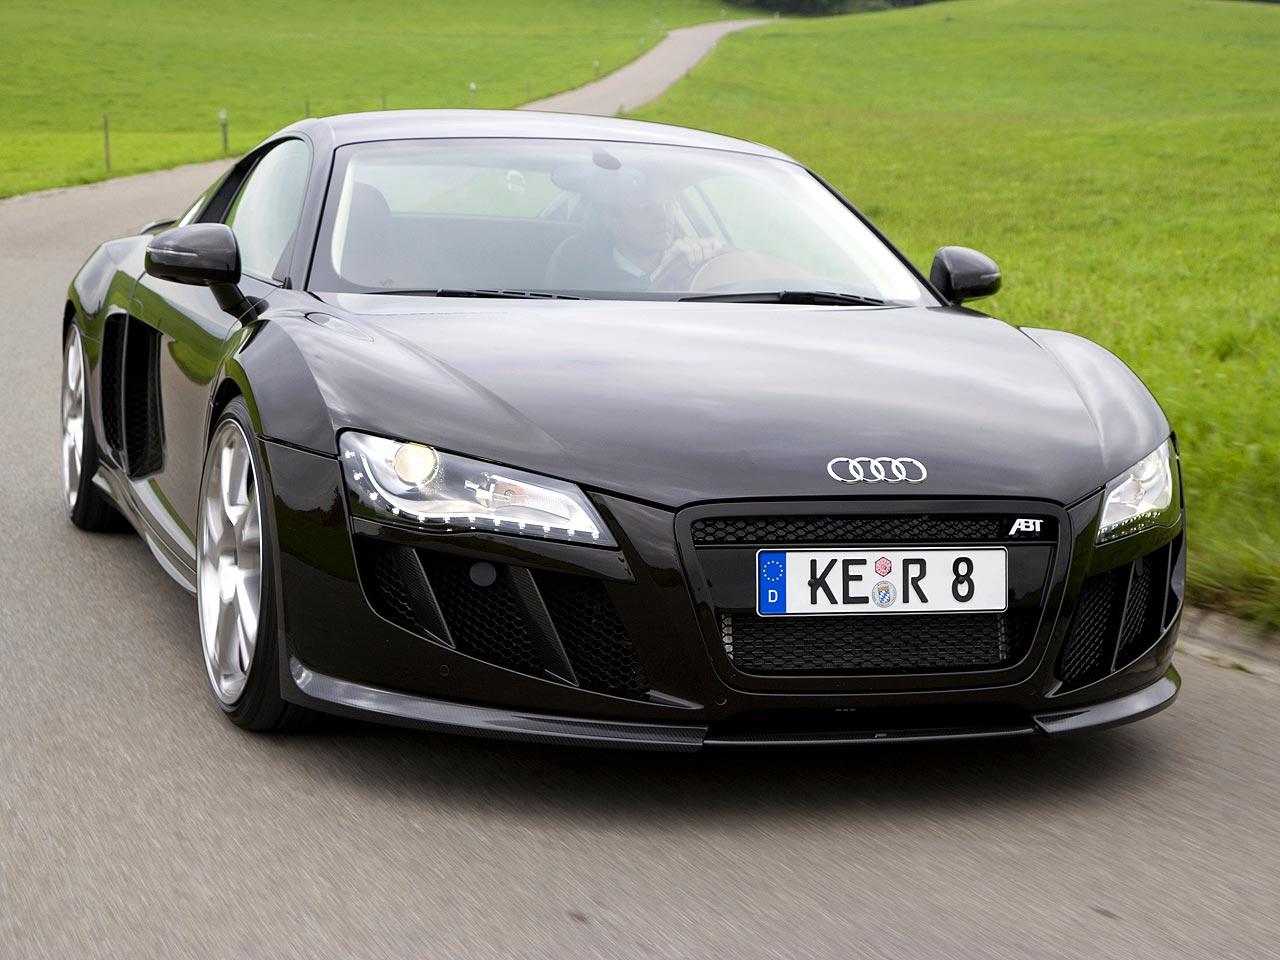 http://1.bp.blogspot.com/-eDE6n6dc070/T8Uo3zy9CdI/AAAAAAAAL6c/K5AfQ6LzO-o/s1600/Audi-R8-HD-Wallpaper.jpg